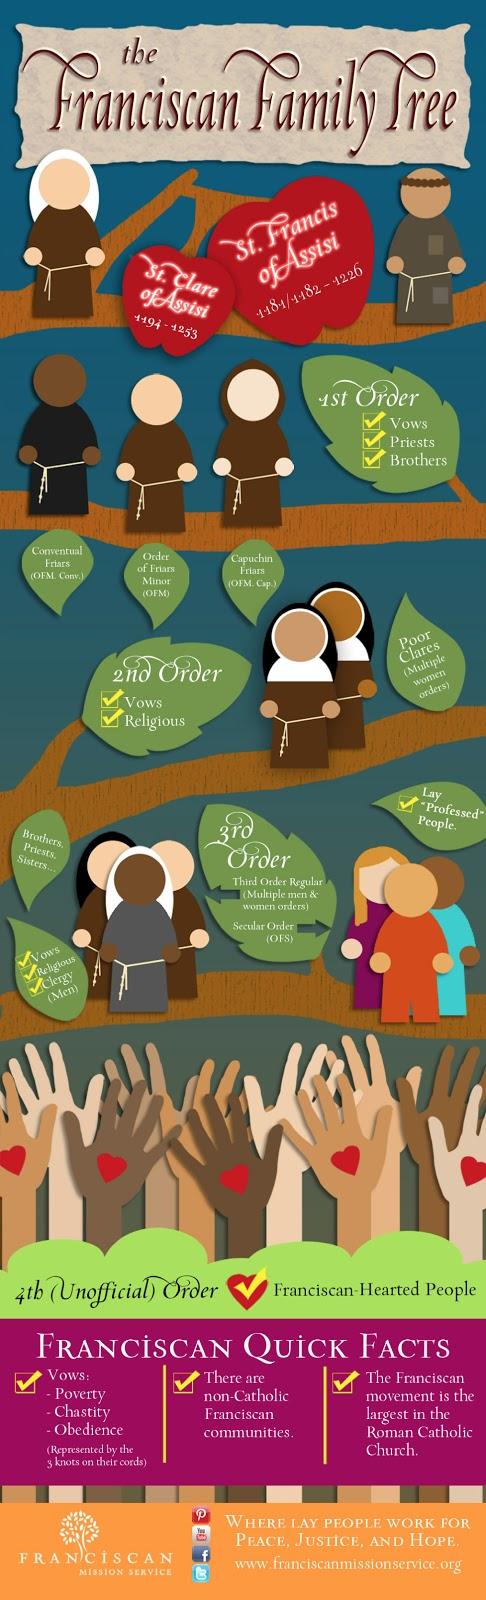 Franciscan Family Tree